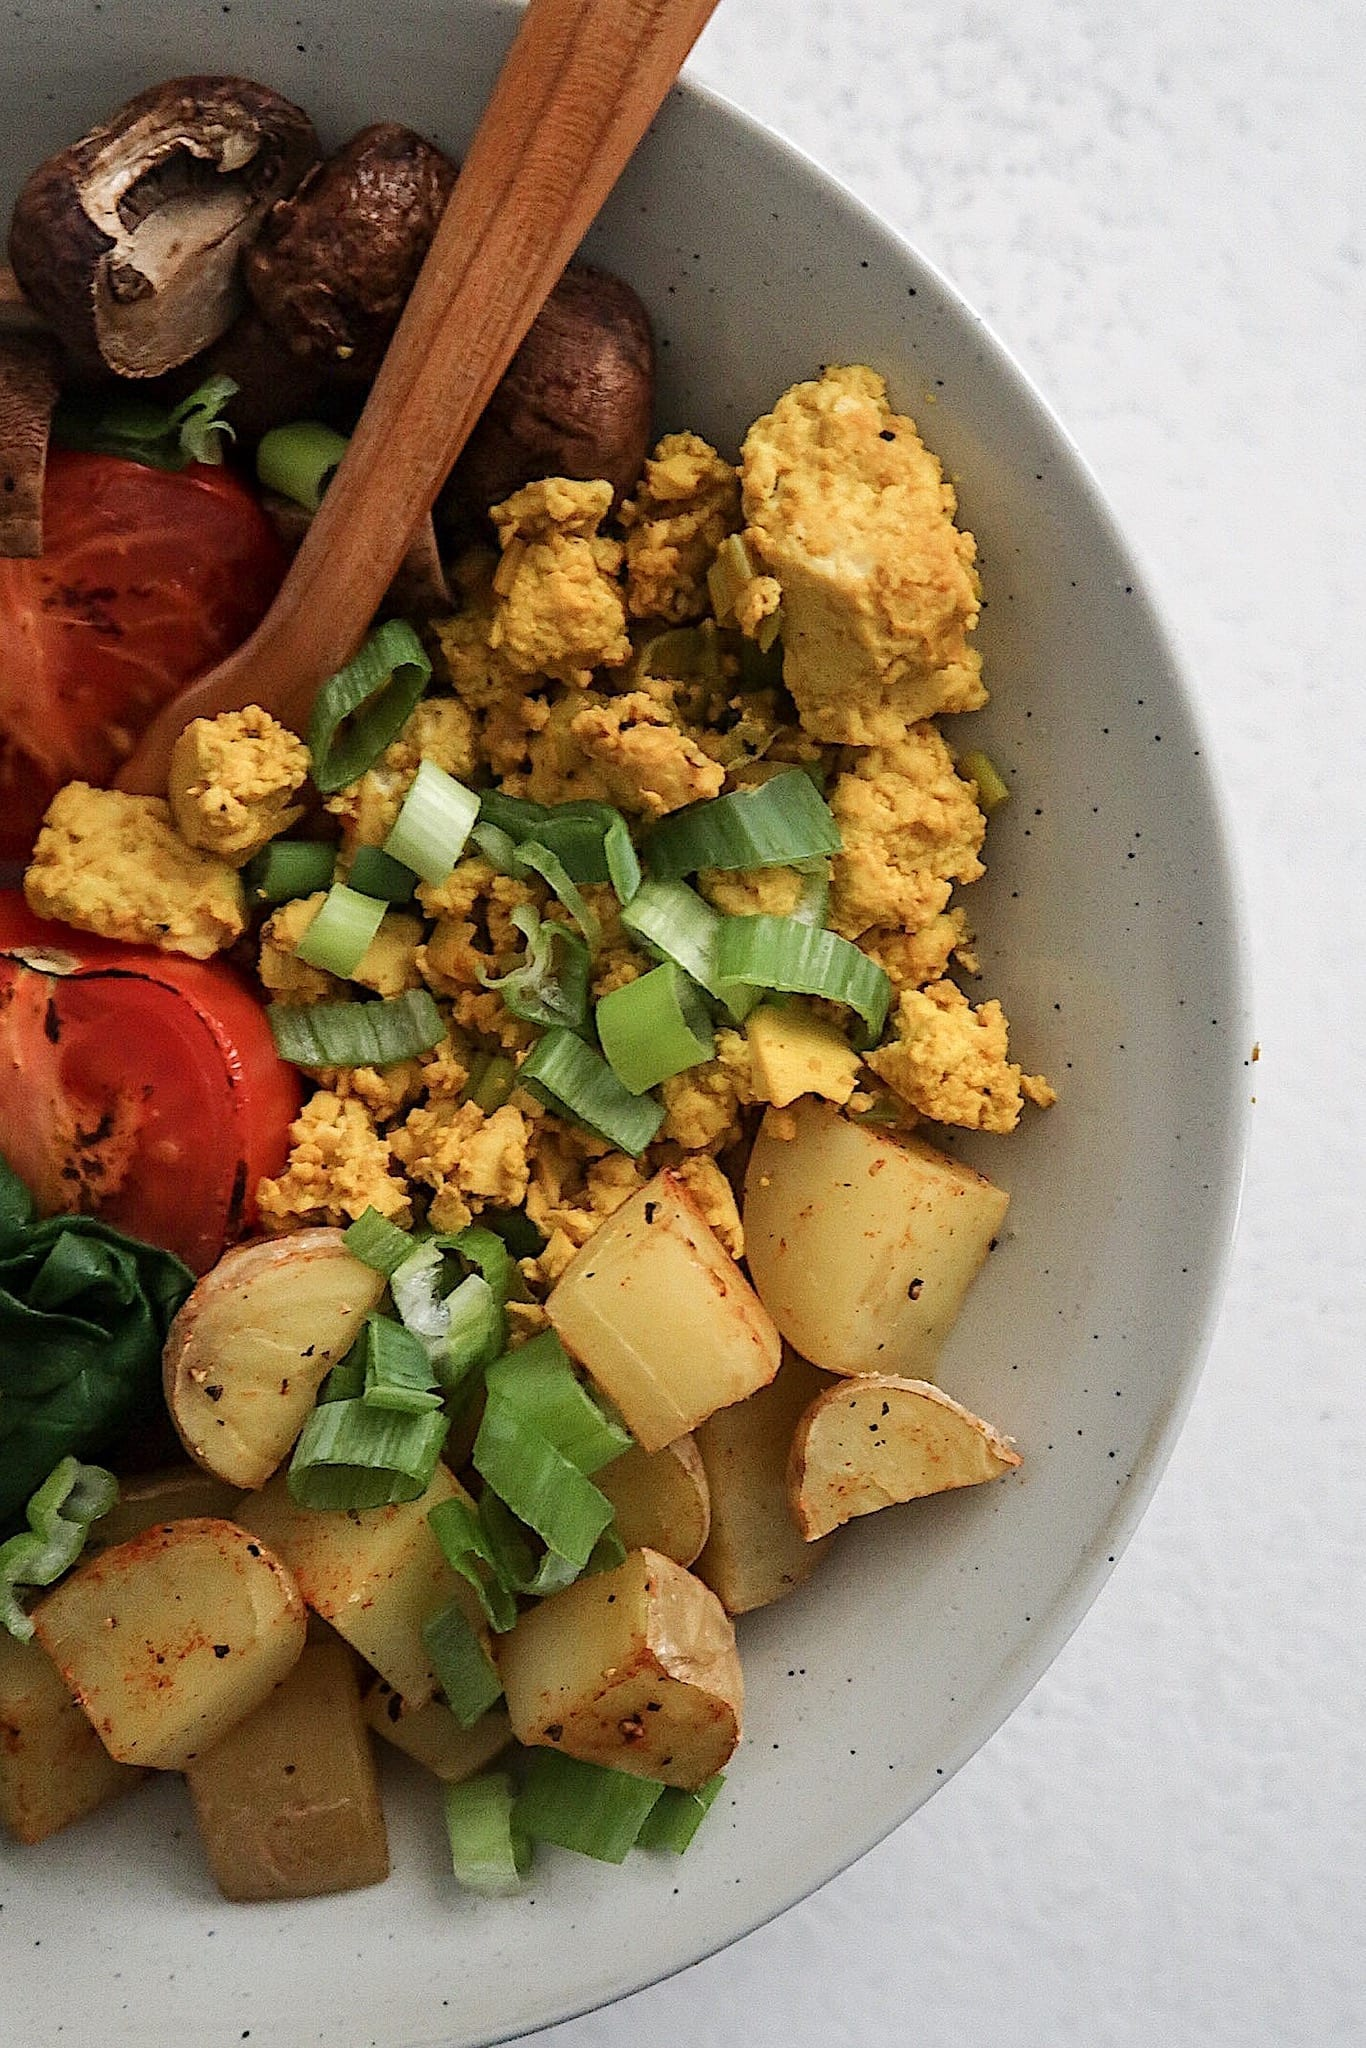 Healthy Vegan Breakfast Recipes, Tofu scramble breakfast bowl